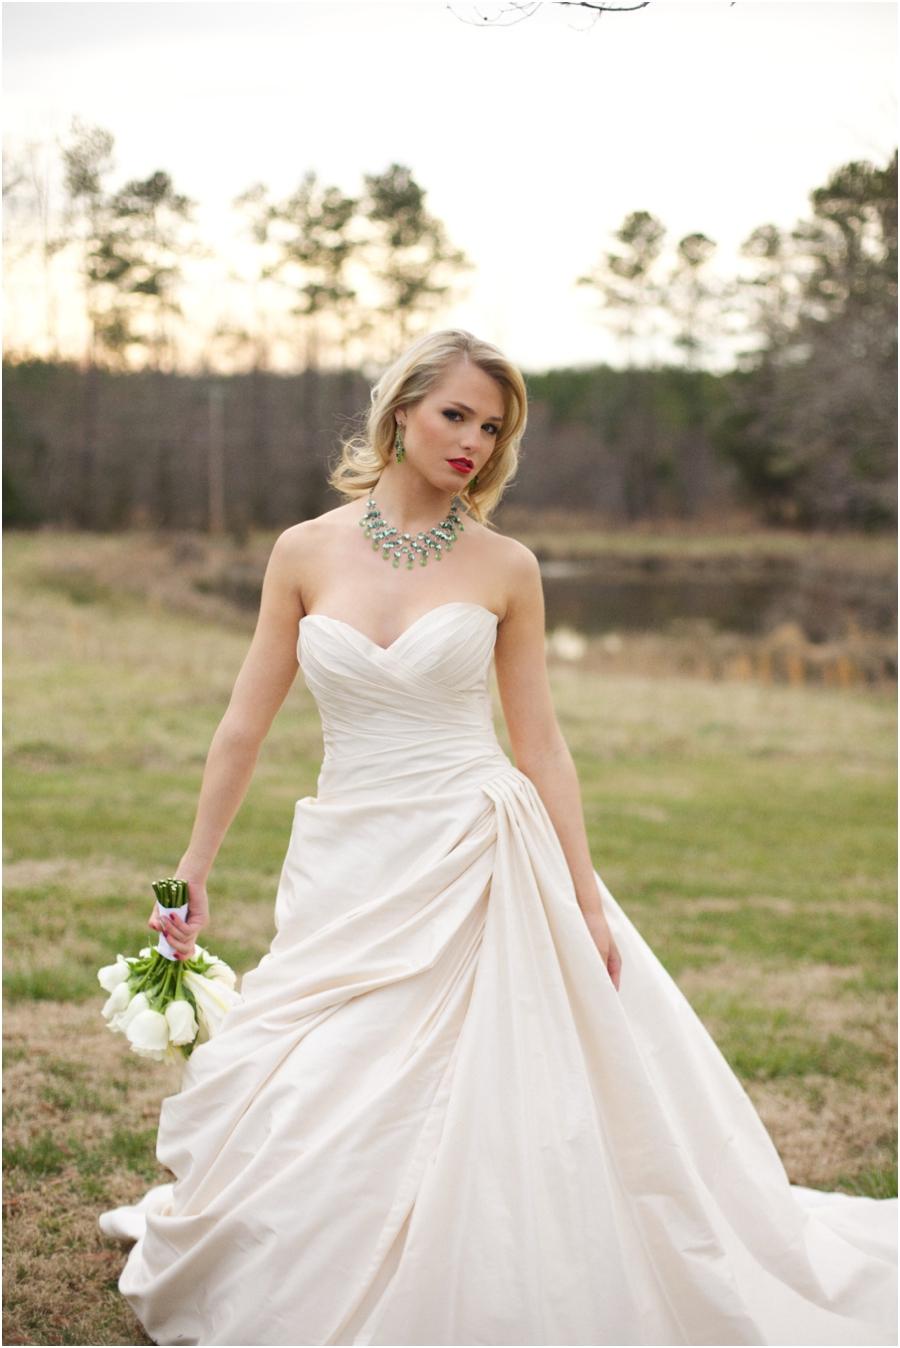 emerald wedding color schemes, bride with emerald statement necklace